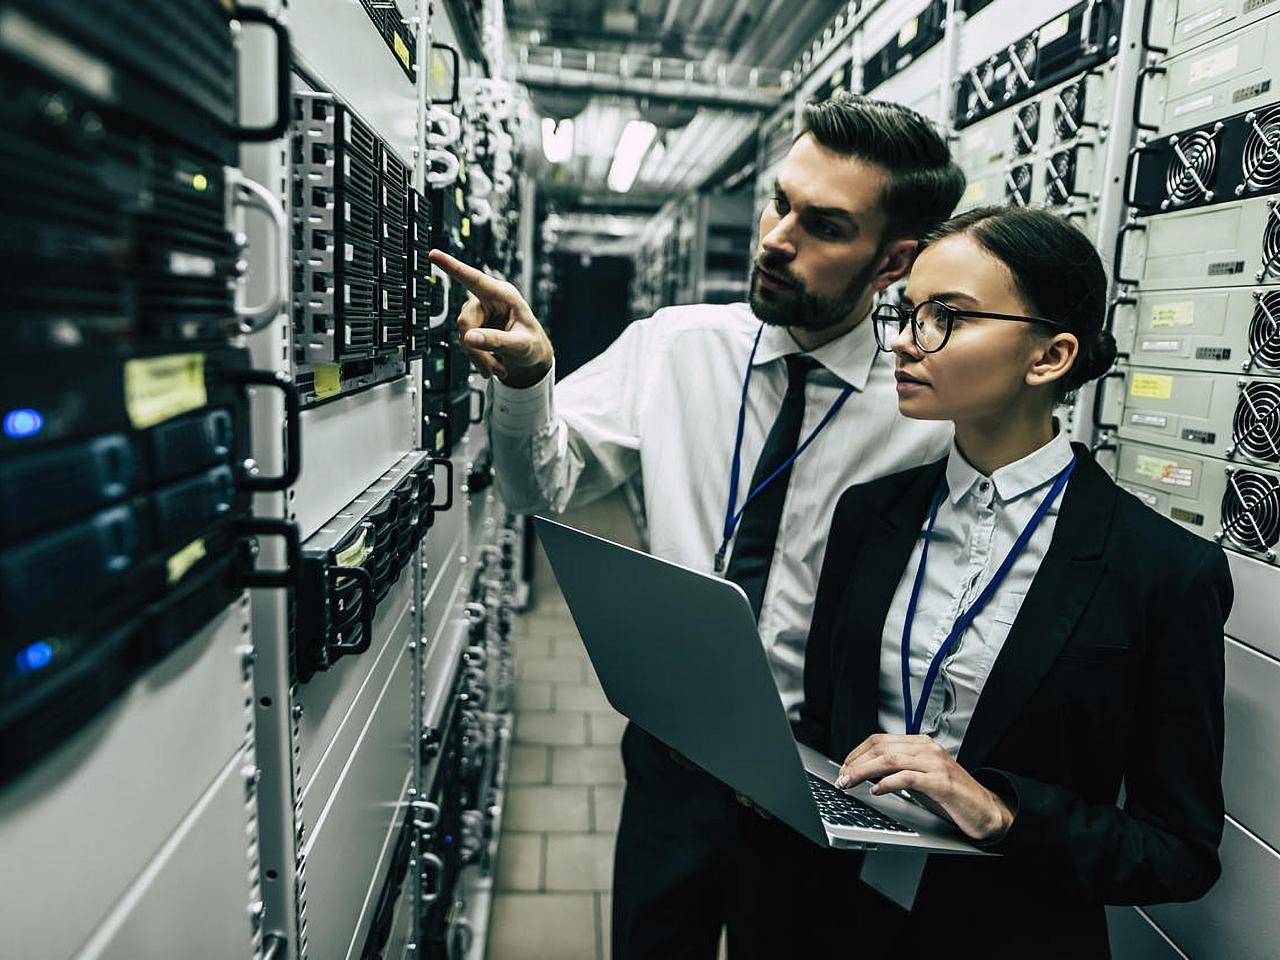 NEC、システムやクラウドと音声連携できるコミュニケーション基盤を提供